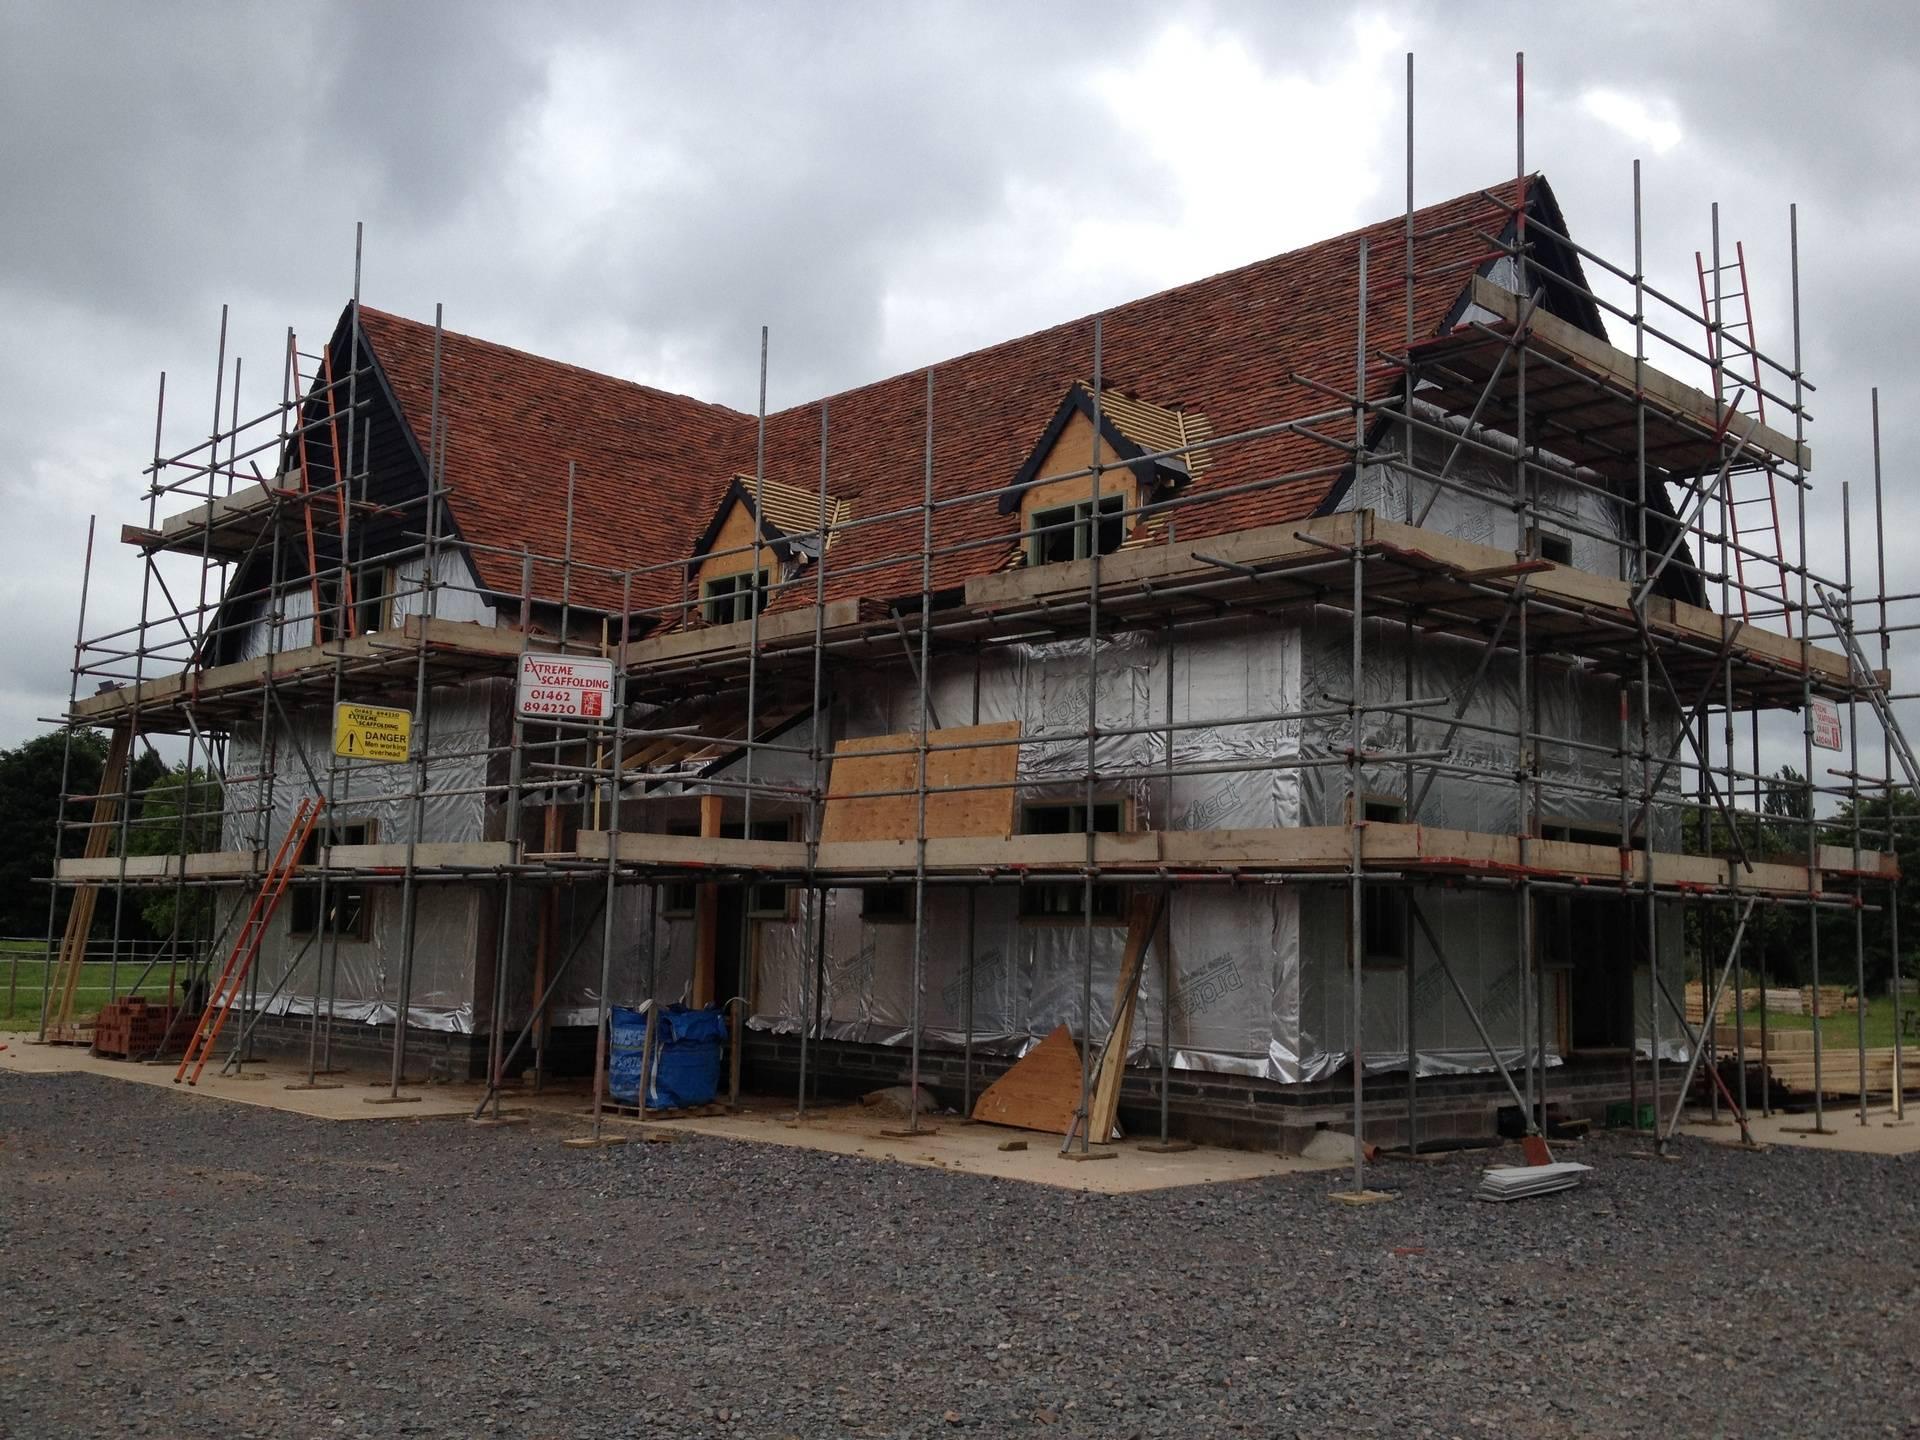 Potton Timber Home in Blunham, Beds